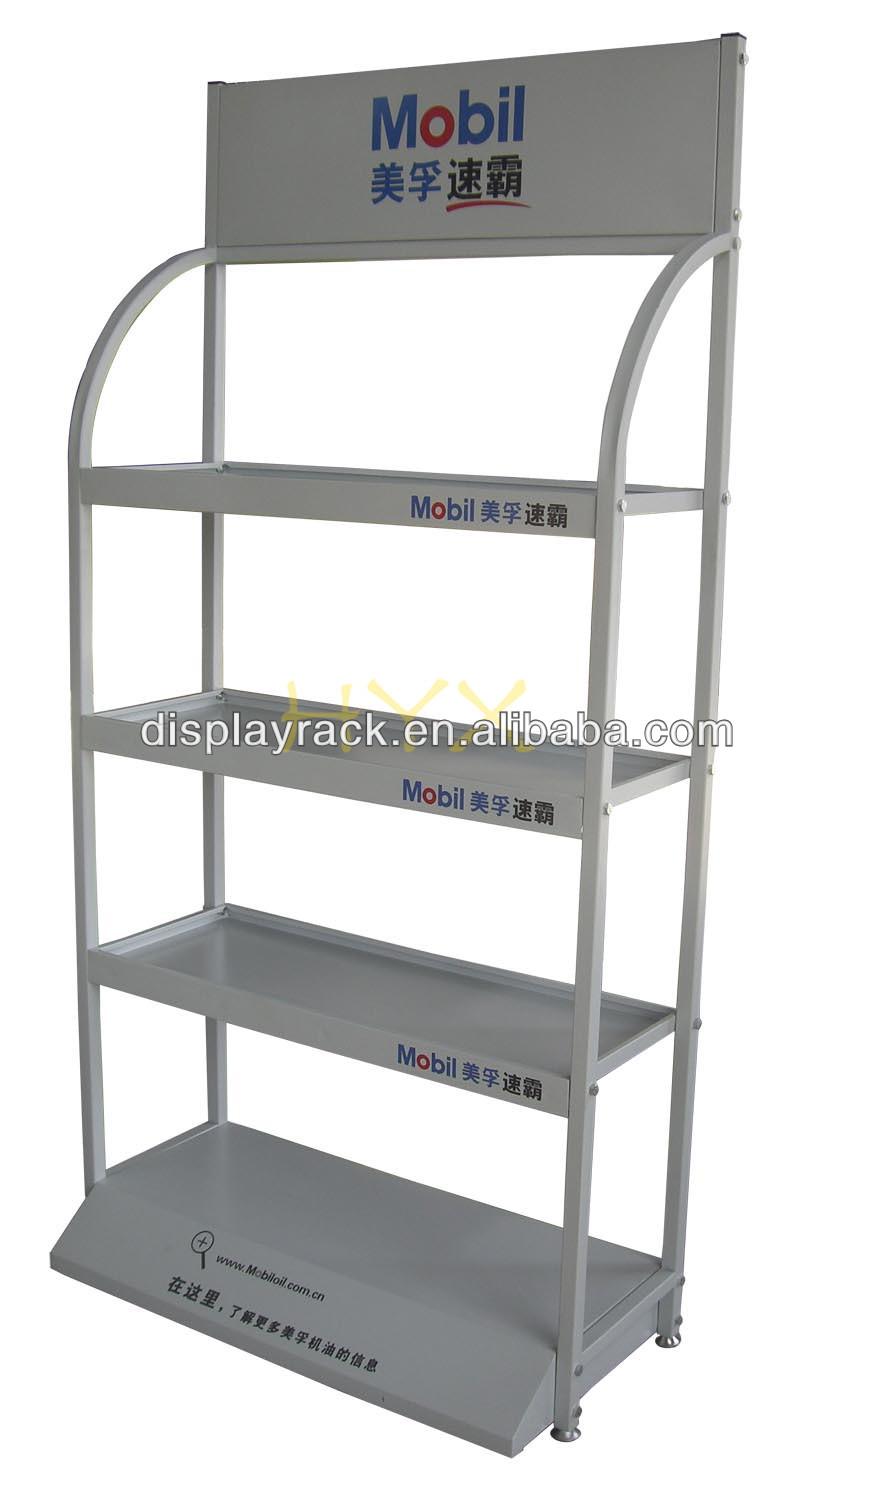 Display Your Rack ~ Three layers lubricating oil display rack engine